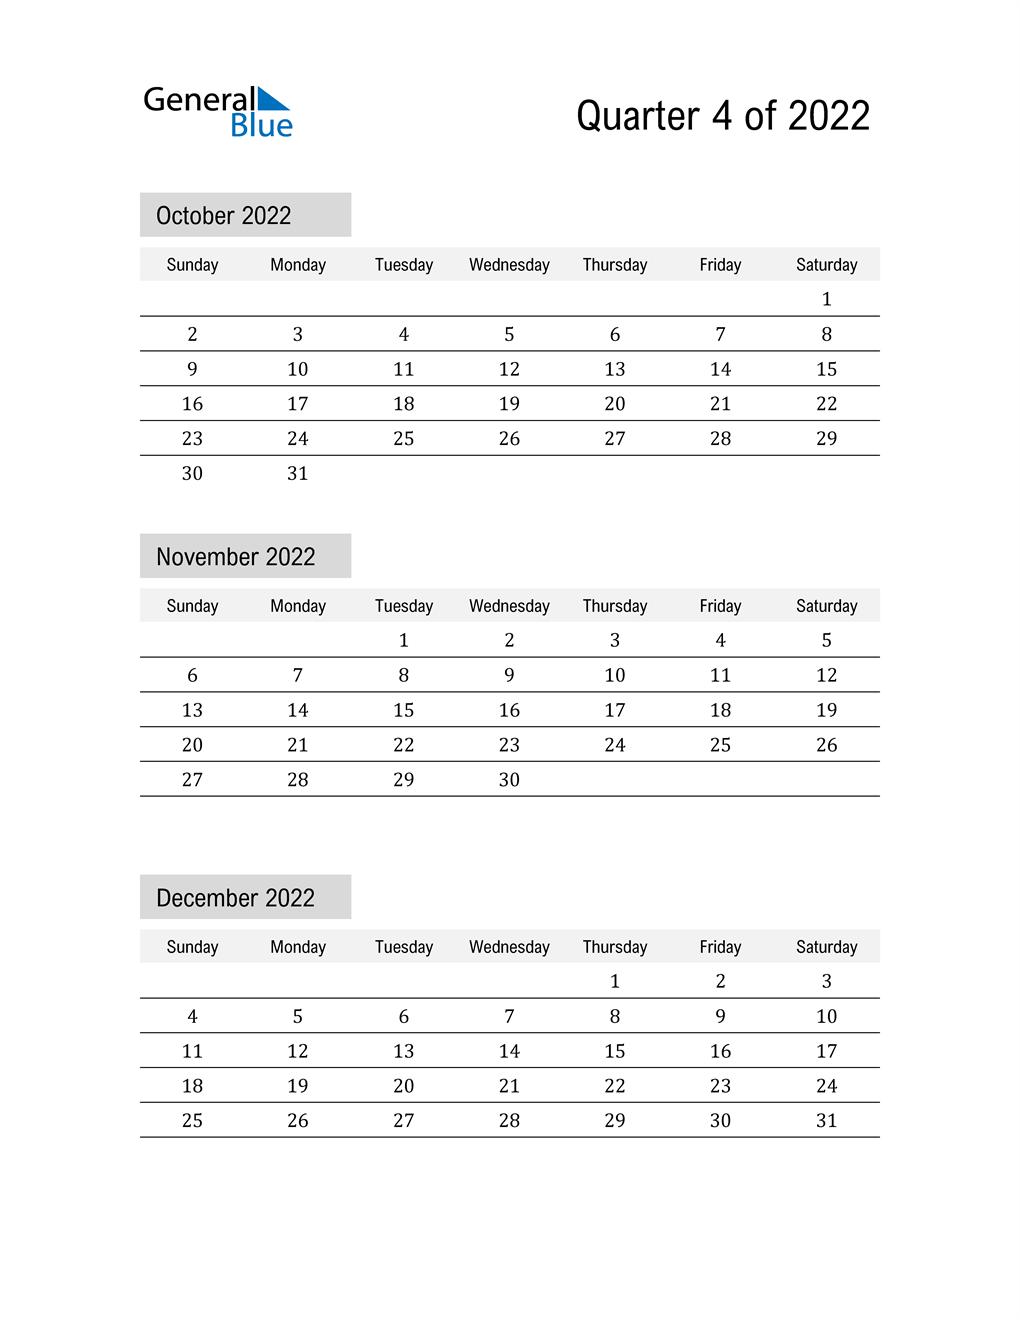 October, November, and December Calendar 2022